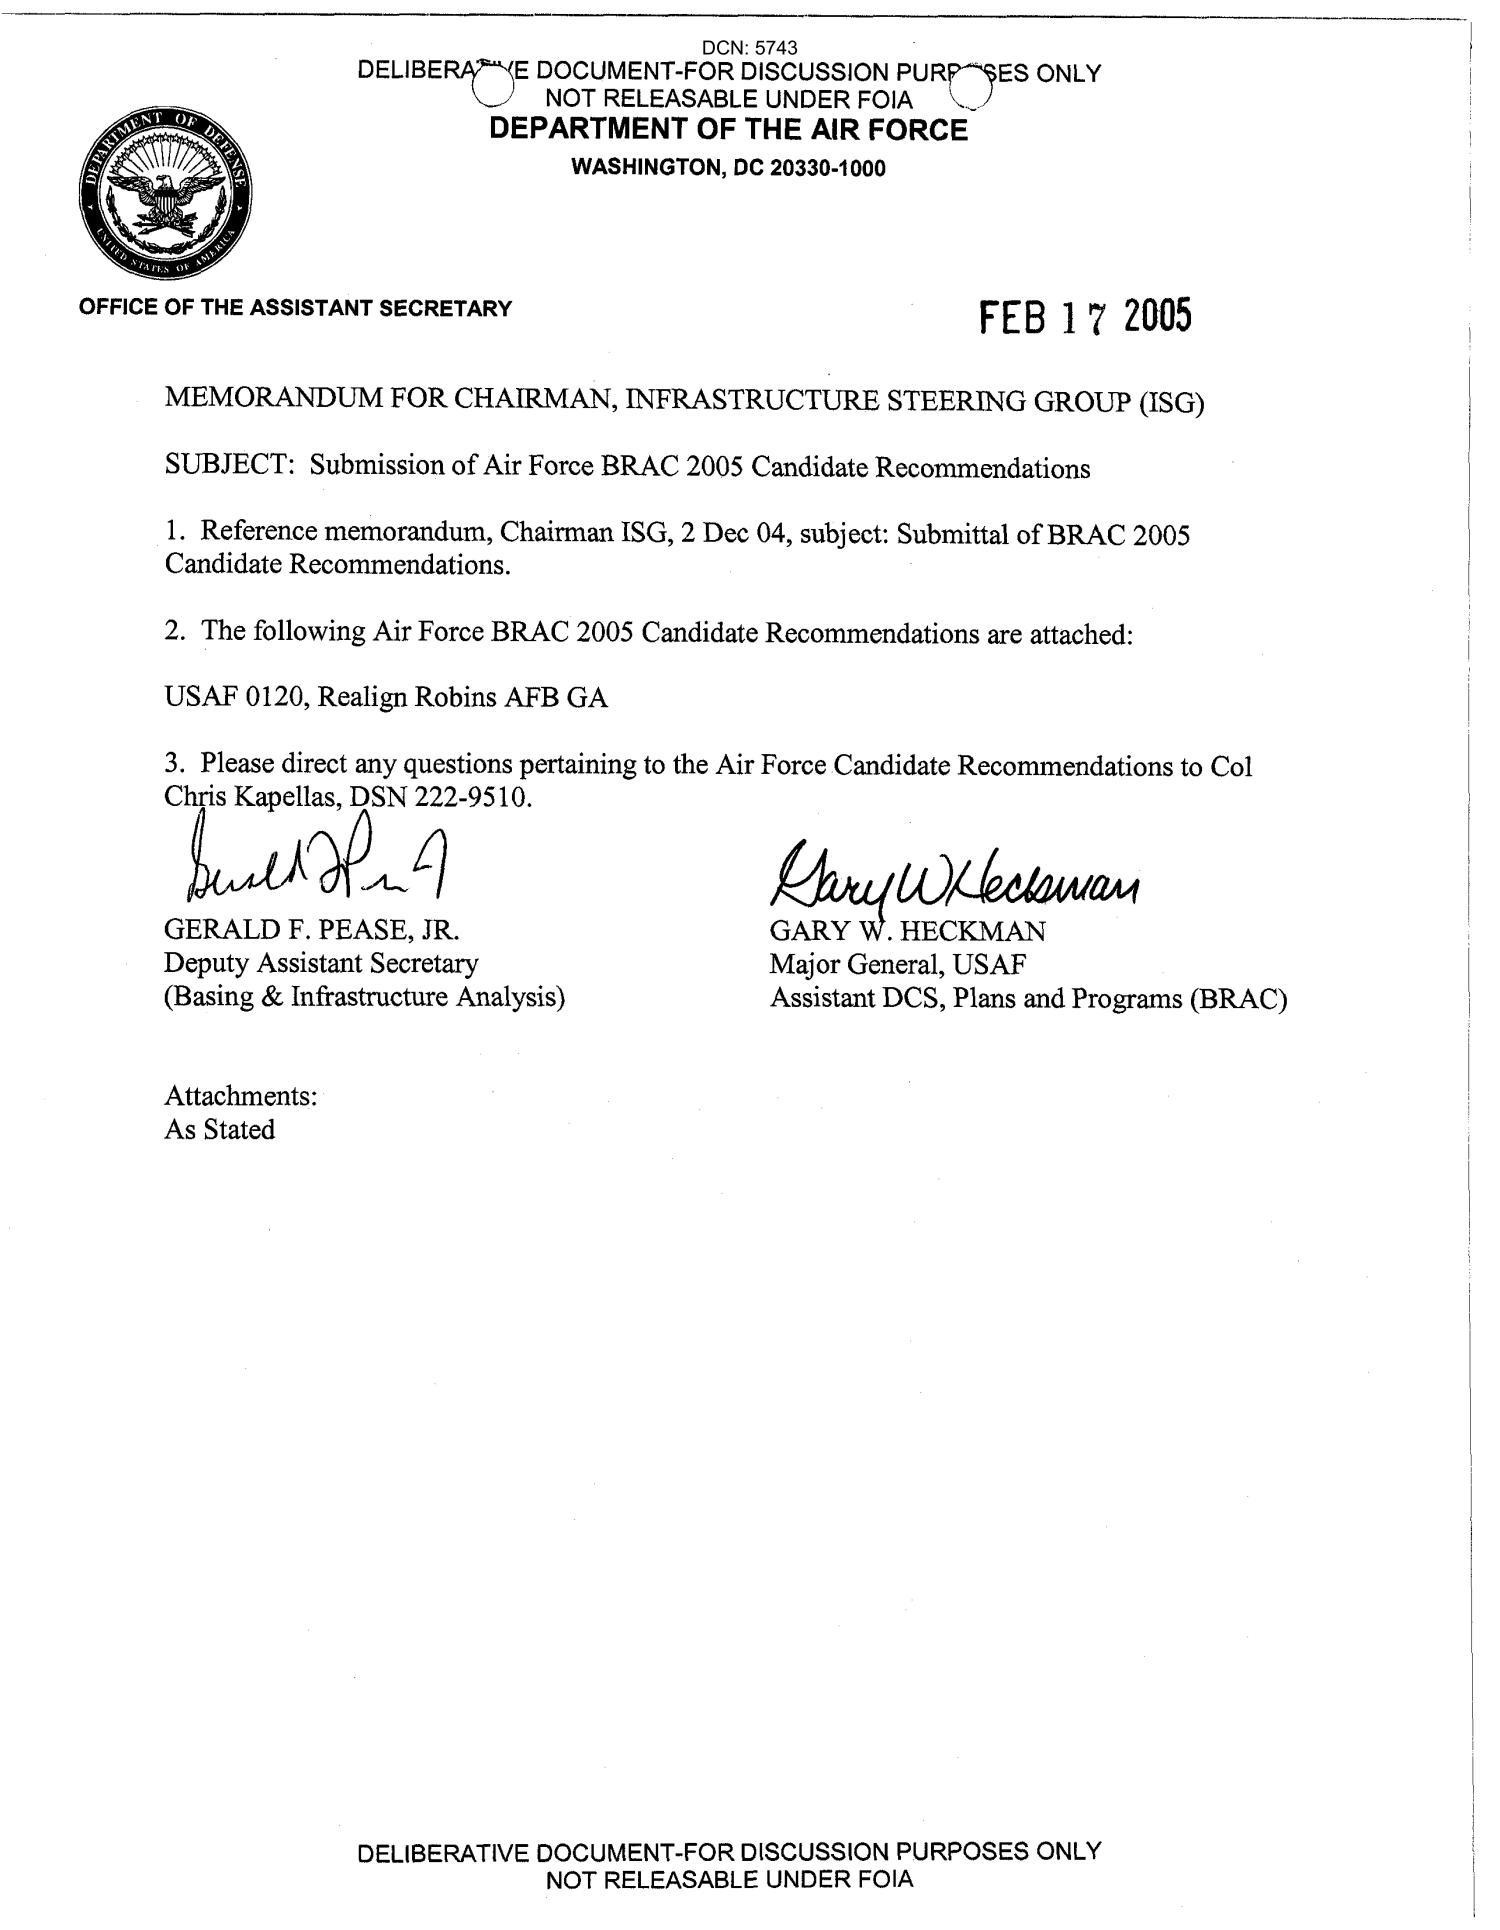 BRAC Transmittal Memo USAF 0120 433  Digital Library